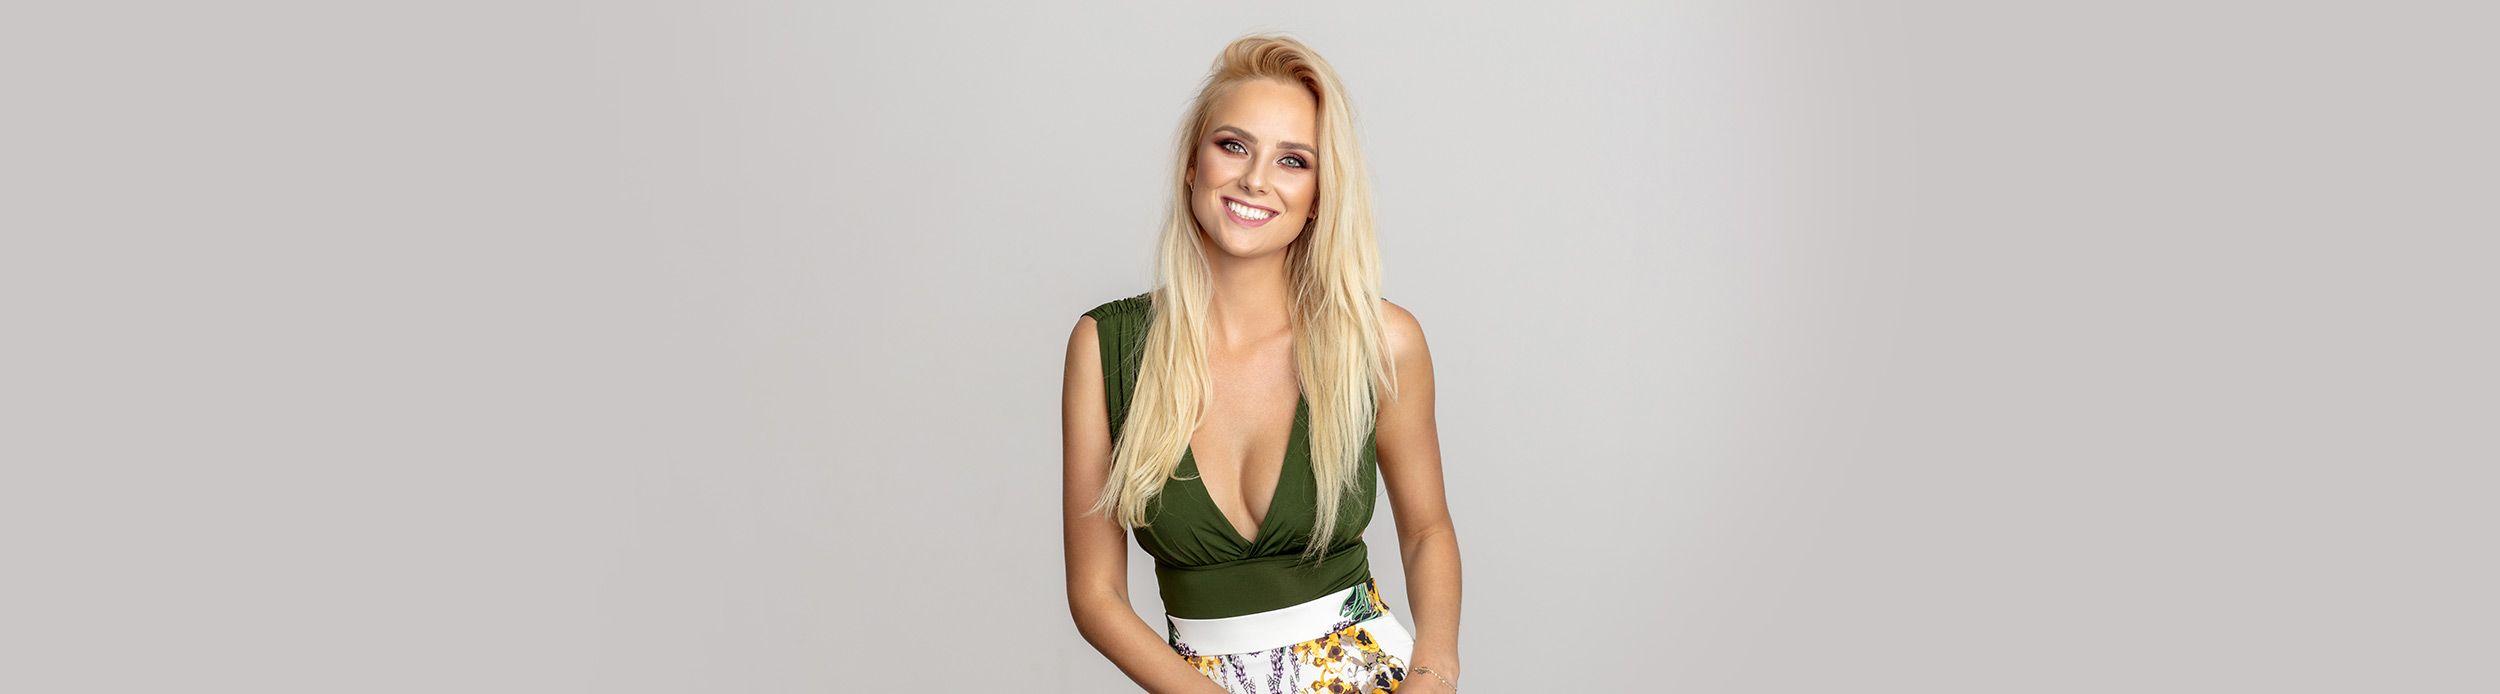 Blonde woman a green top